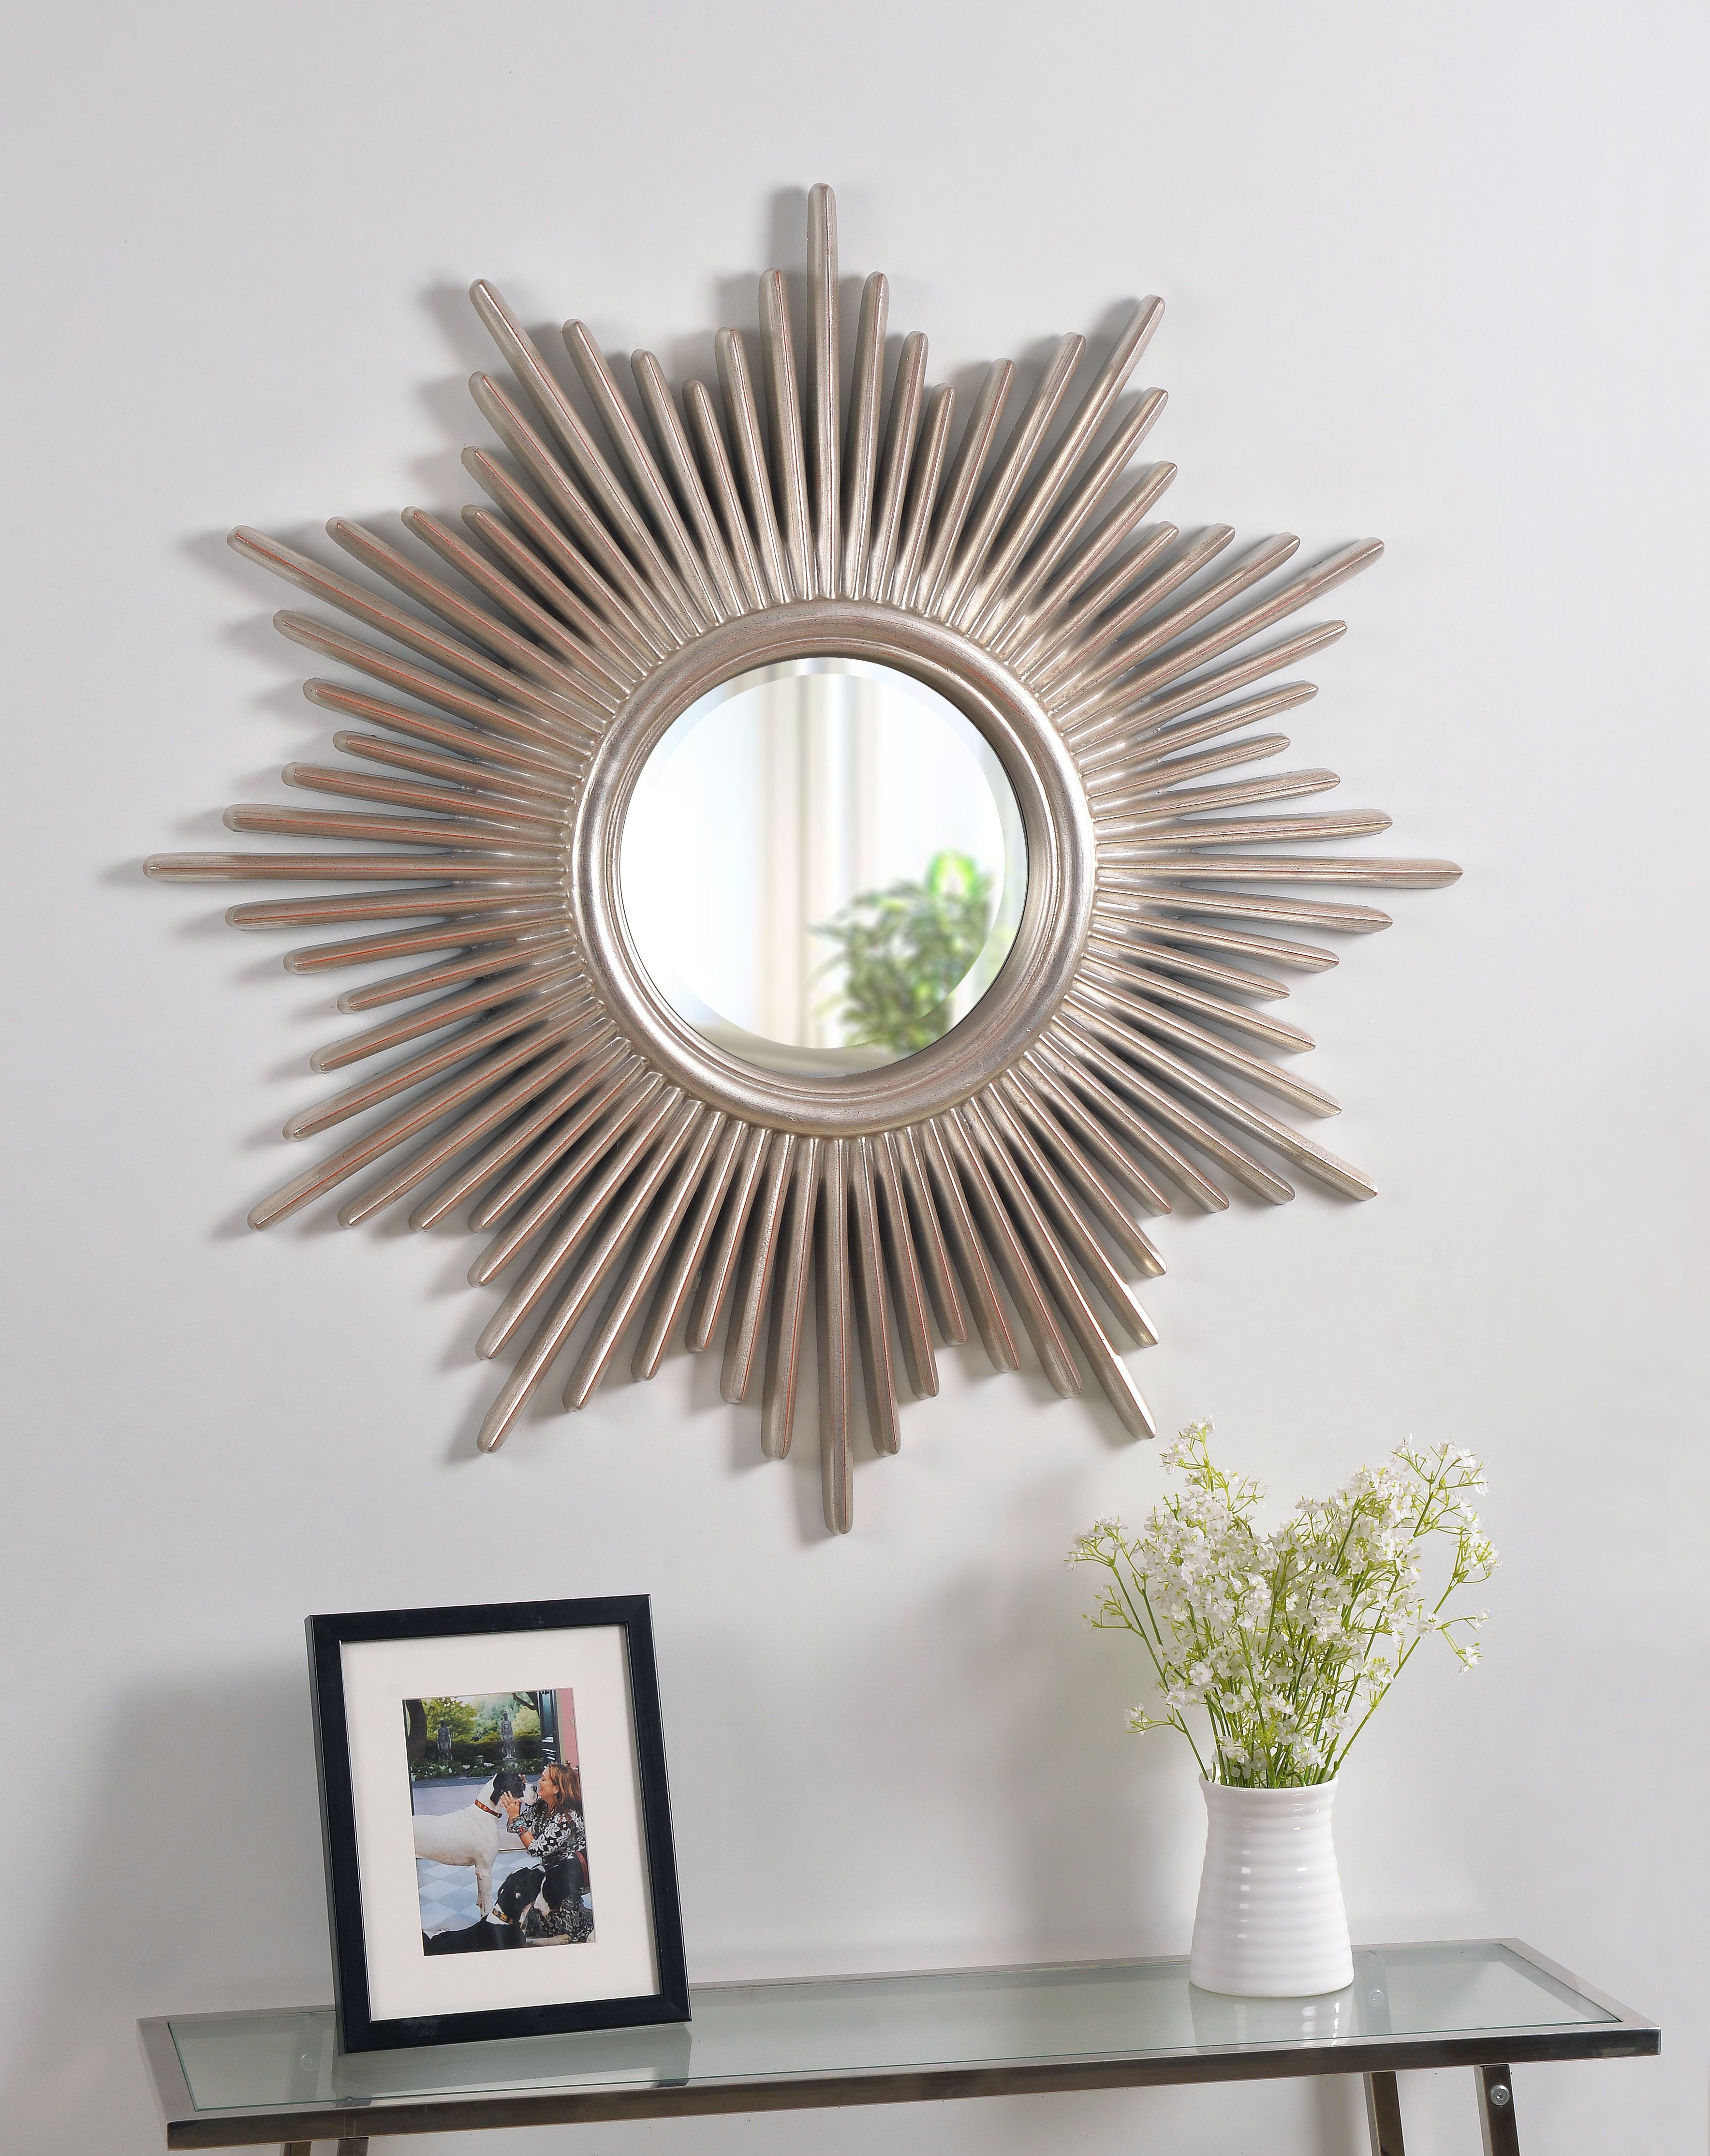 Willa Arlo Interiors Josephson Starburst Glam Beveled Accent Wall Mirror Pertaining To Brynn Accent Mirrors (View 10 of 30)